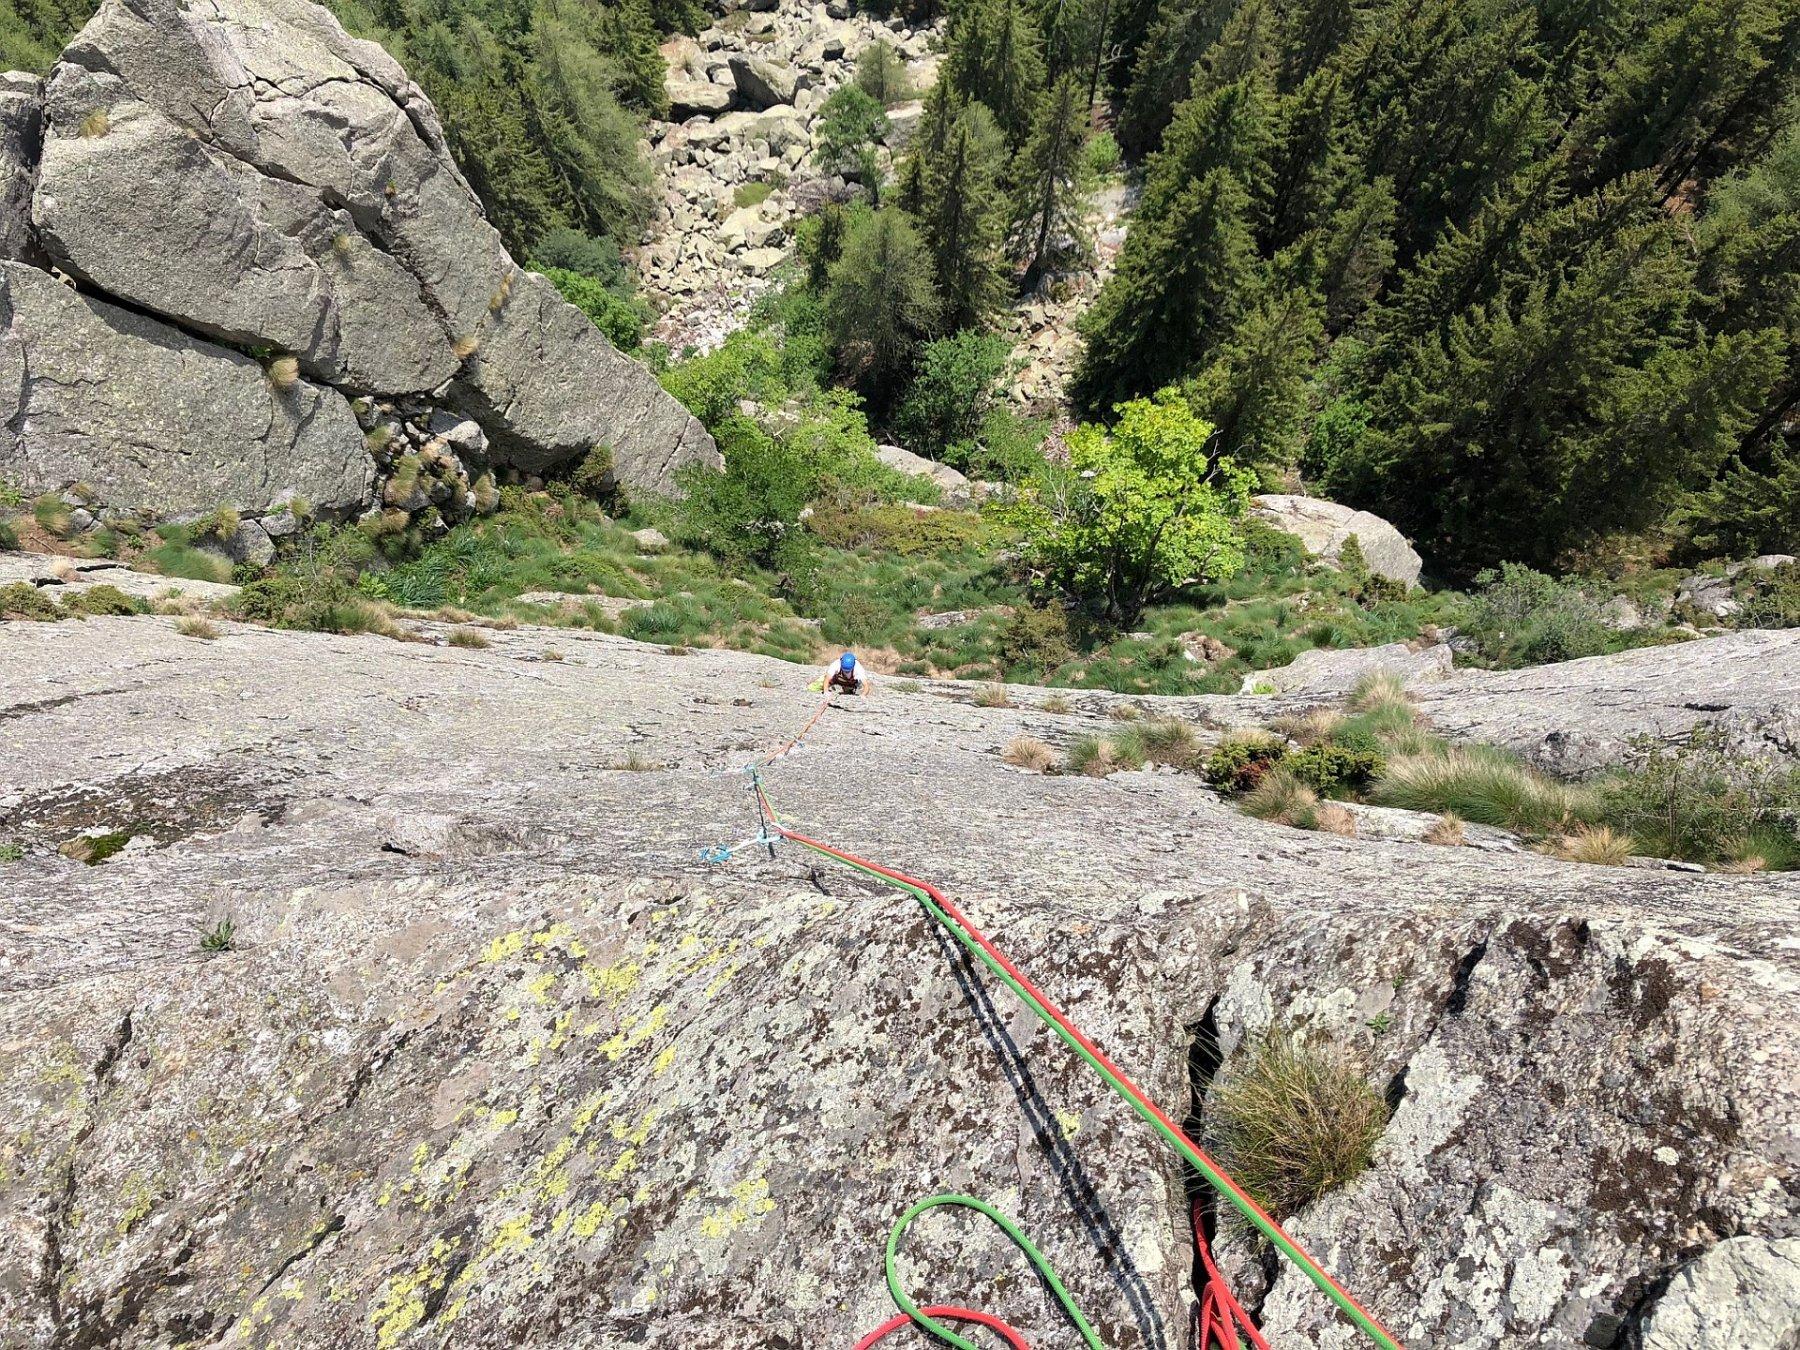 Roci Ruta (Bec di) Base jump, Il tempo di Mudjakewis & other 2018-06-15